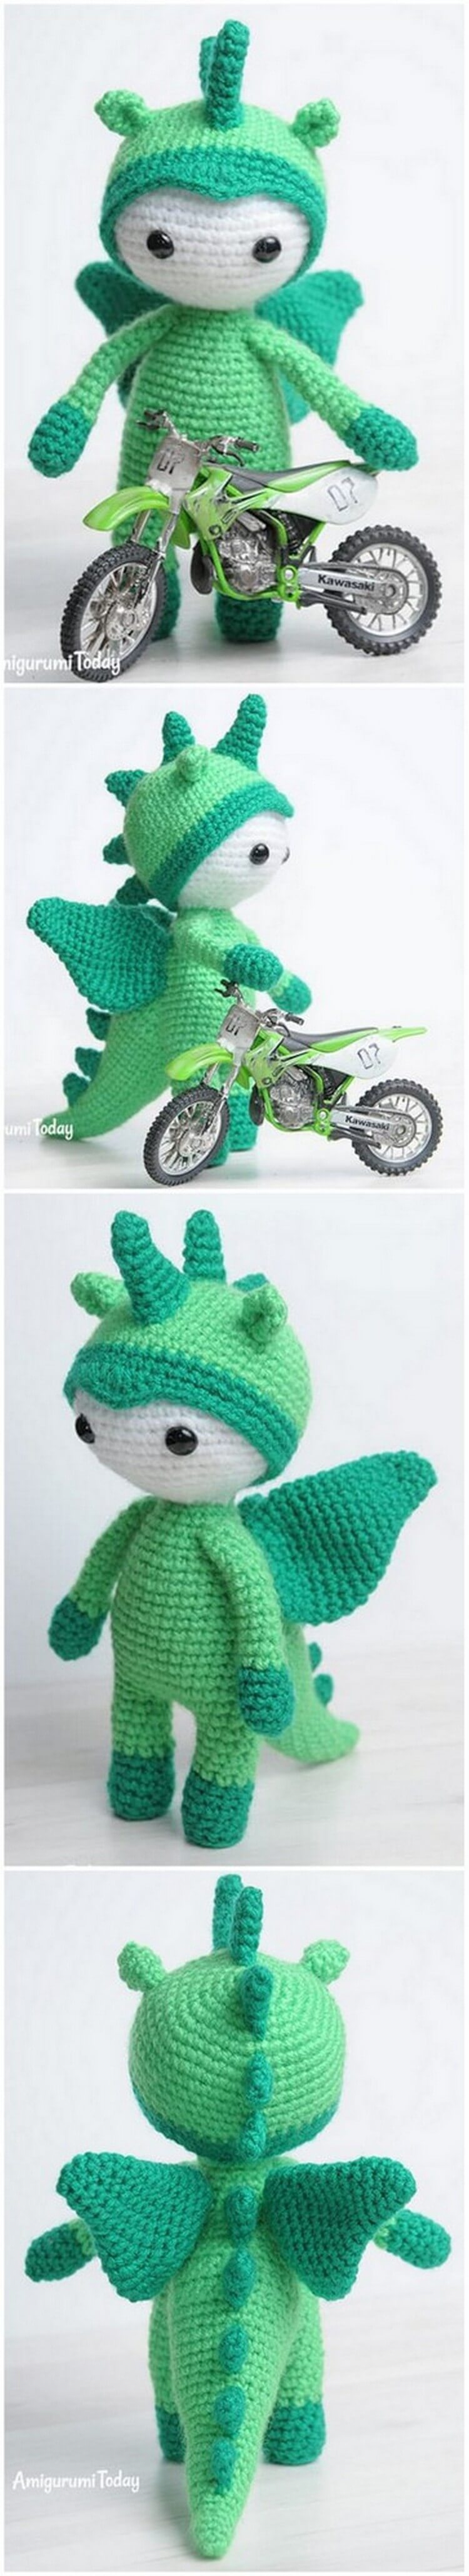 Crochet Amigurumi Pattern (55)